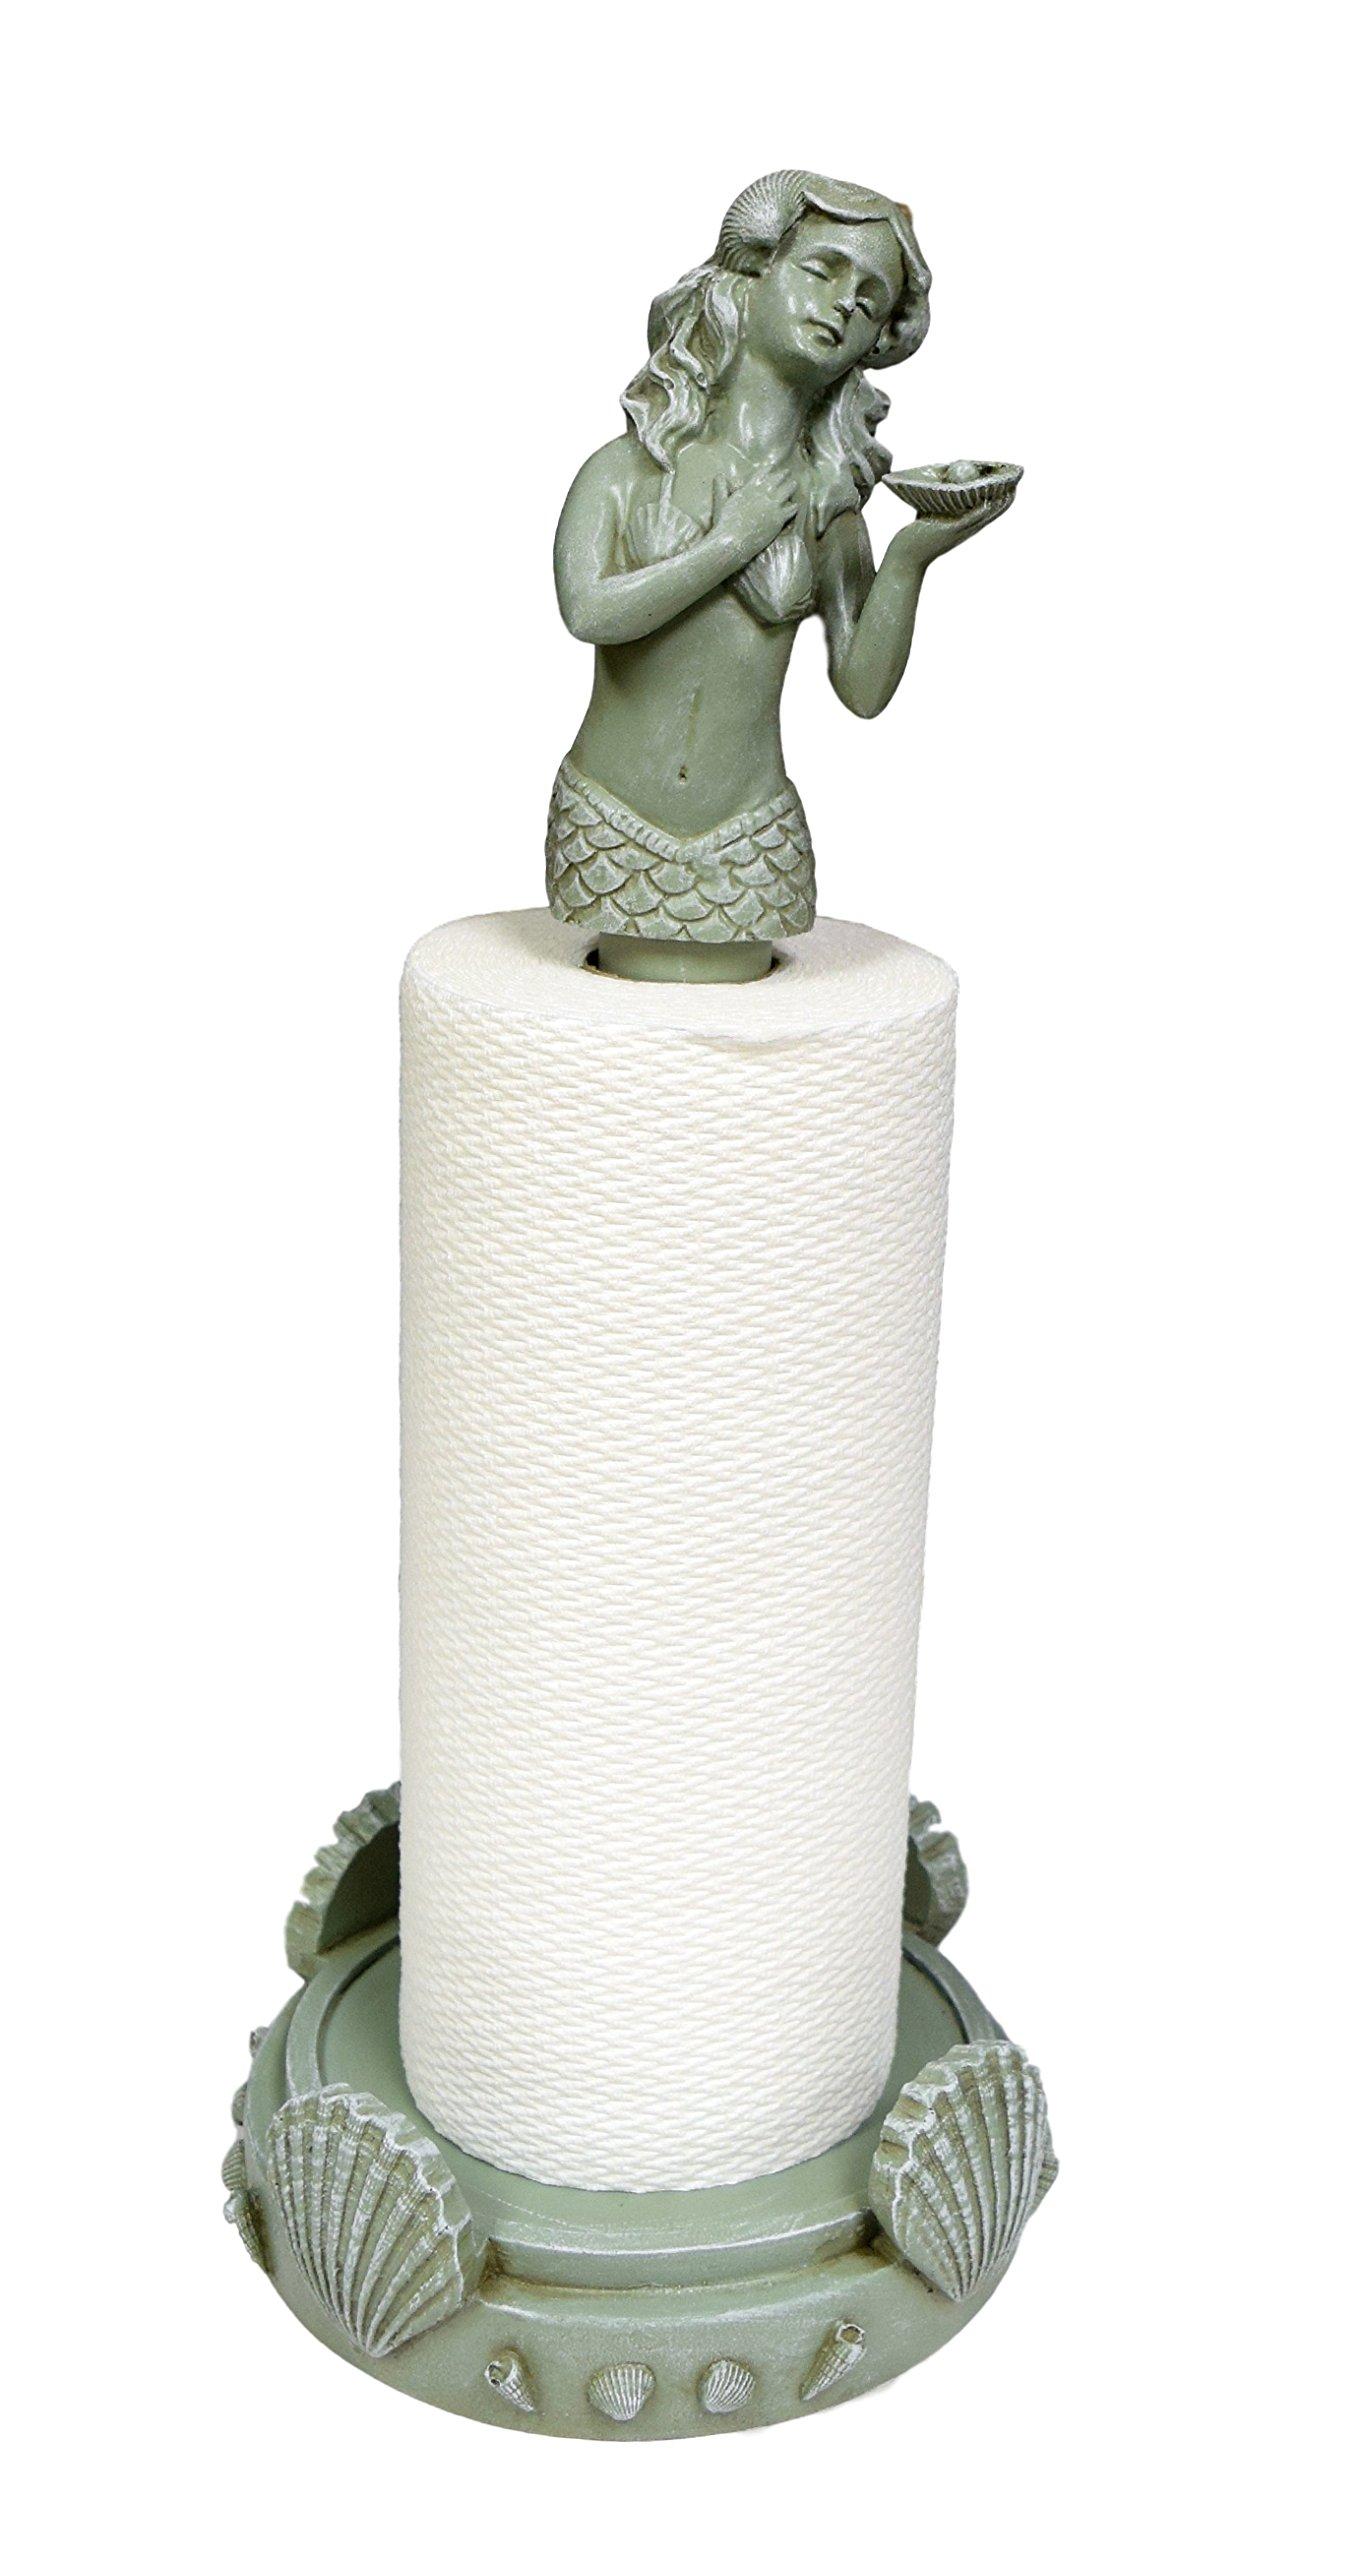 Hickory Manor House Mermaid Paper Towel Holder/Seamist Seamiest by Hickory Manor House